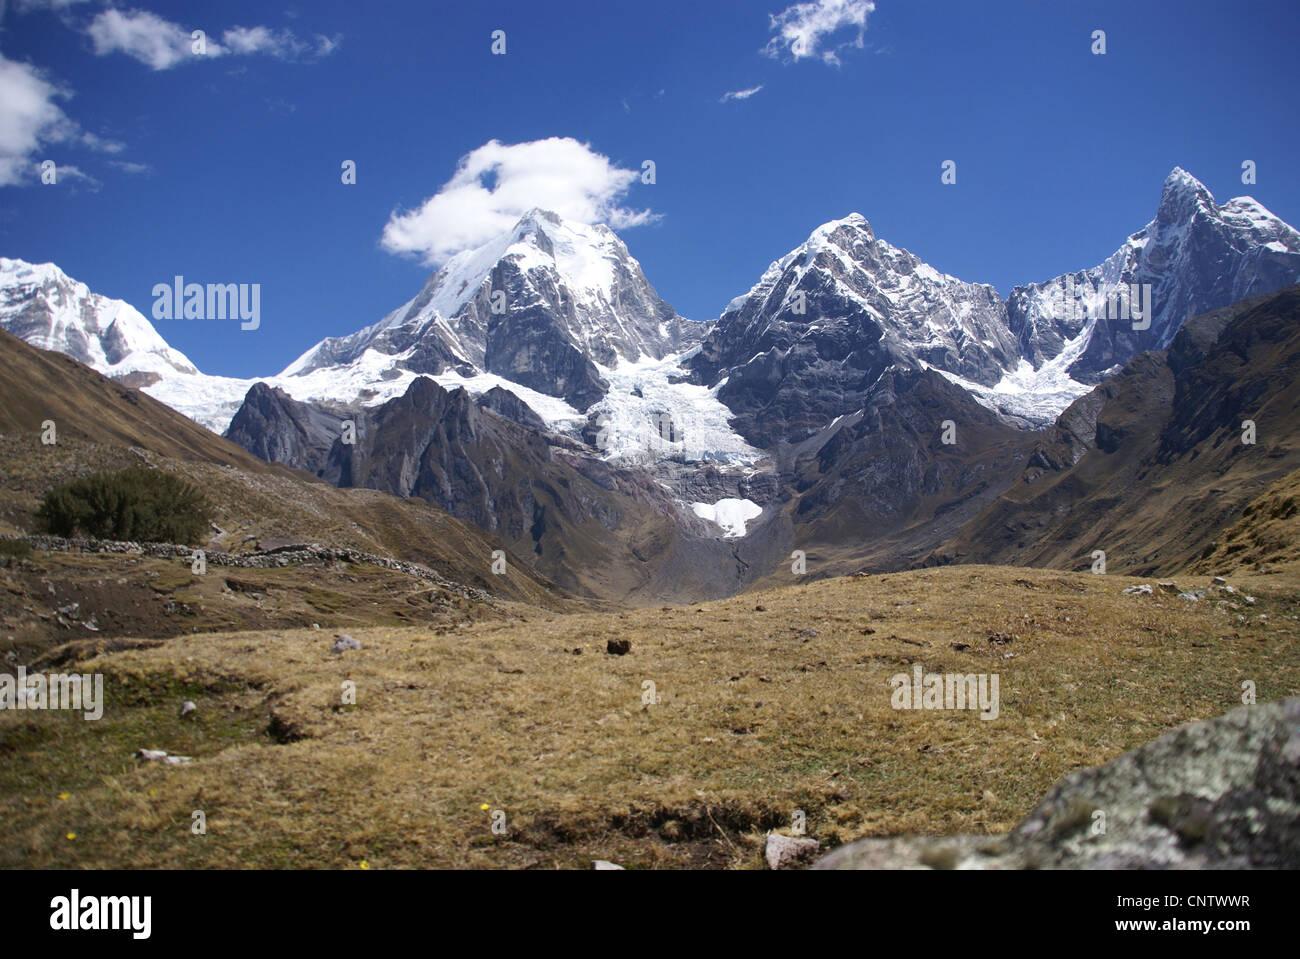 Cordillera Huayhuash, Siula and Yerupaja and lake, Peru, South America - Stock Image